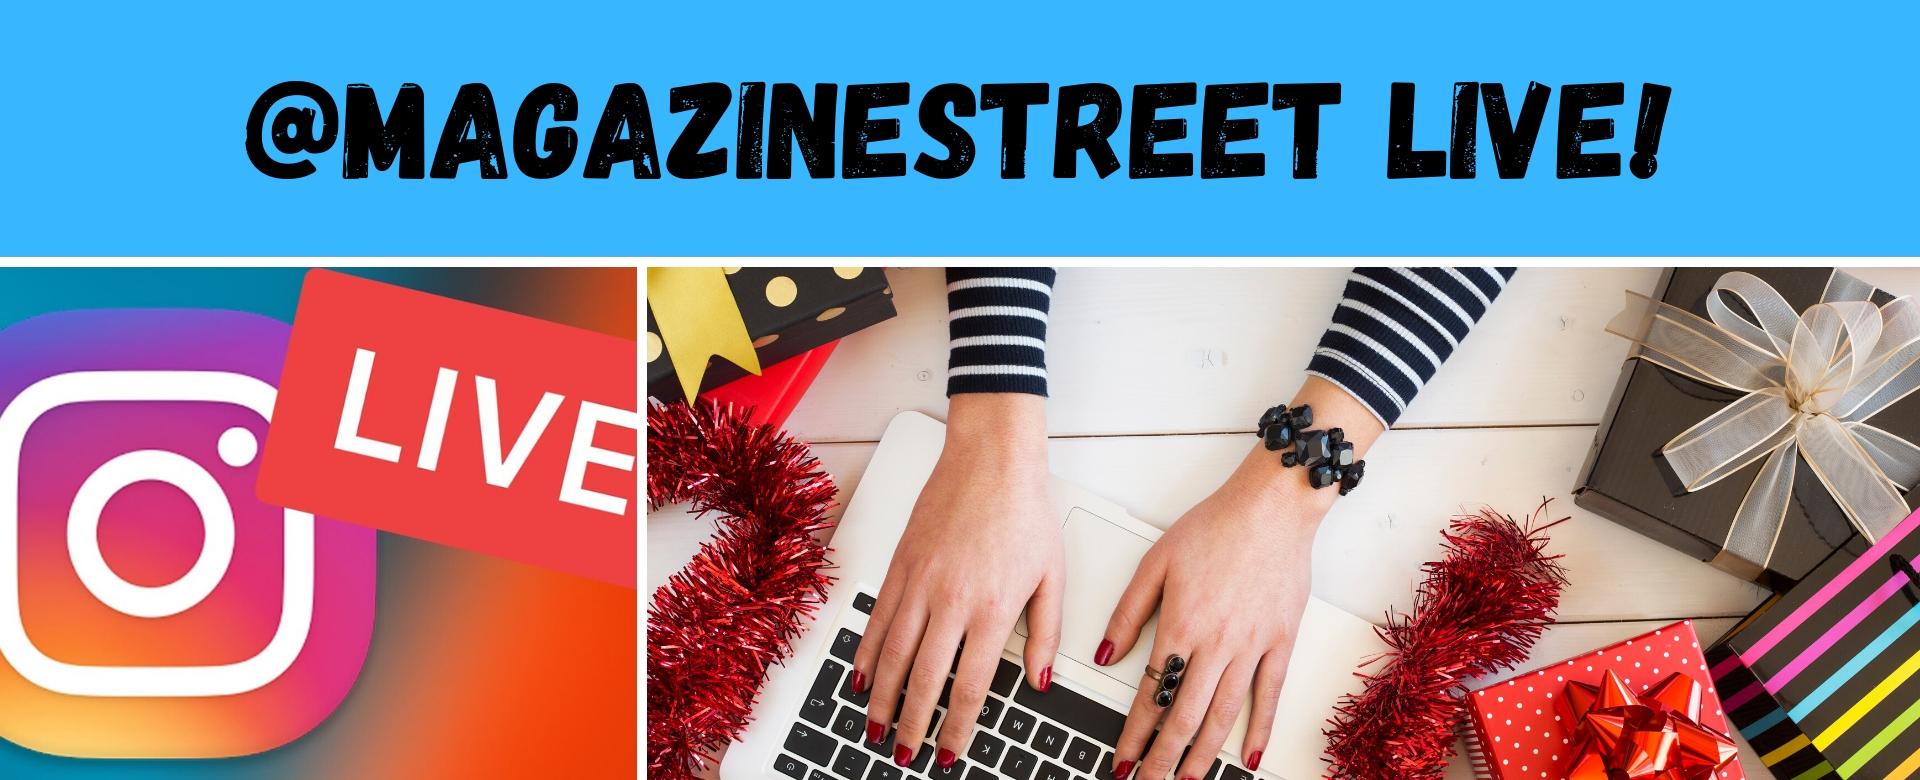 Magazine Street Live!